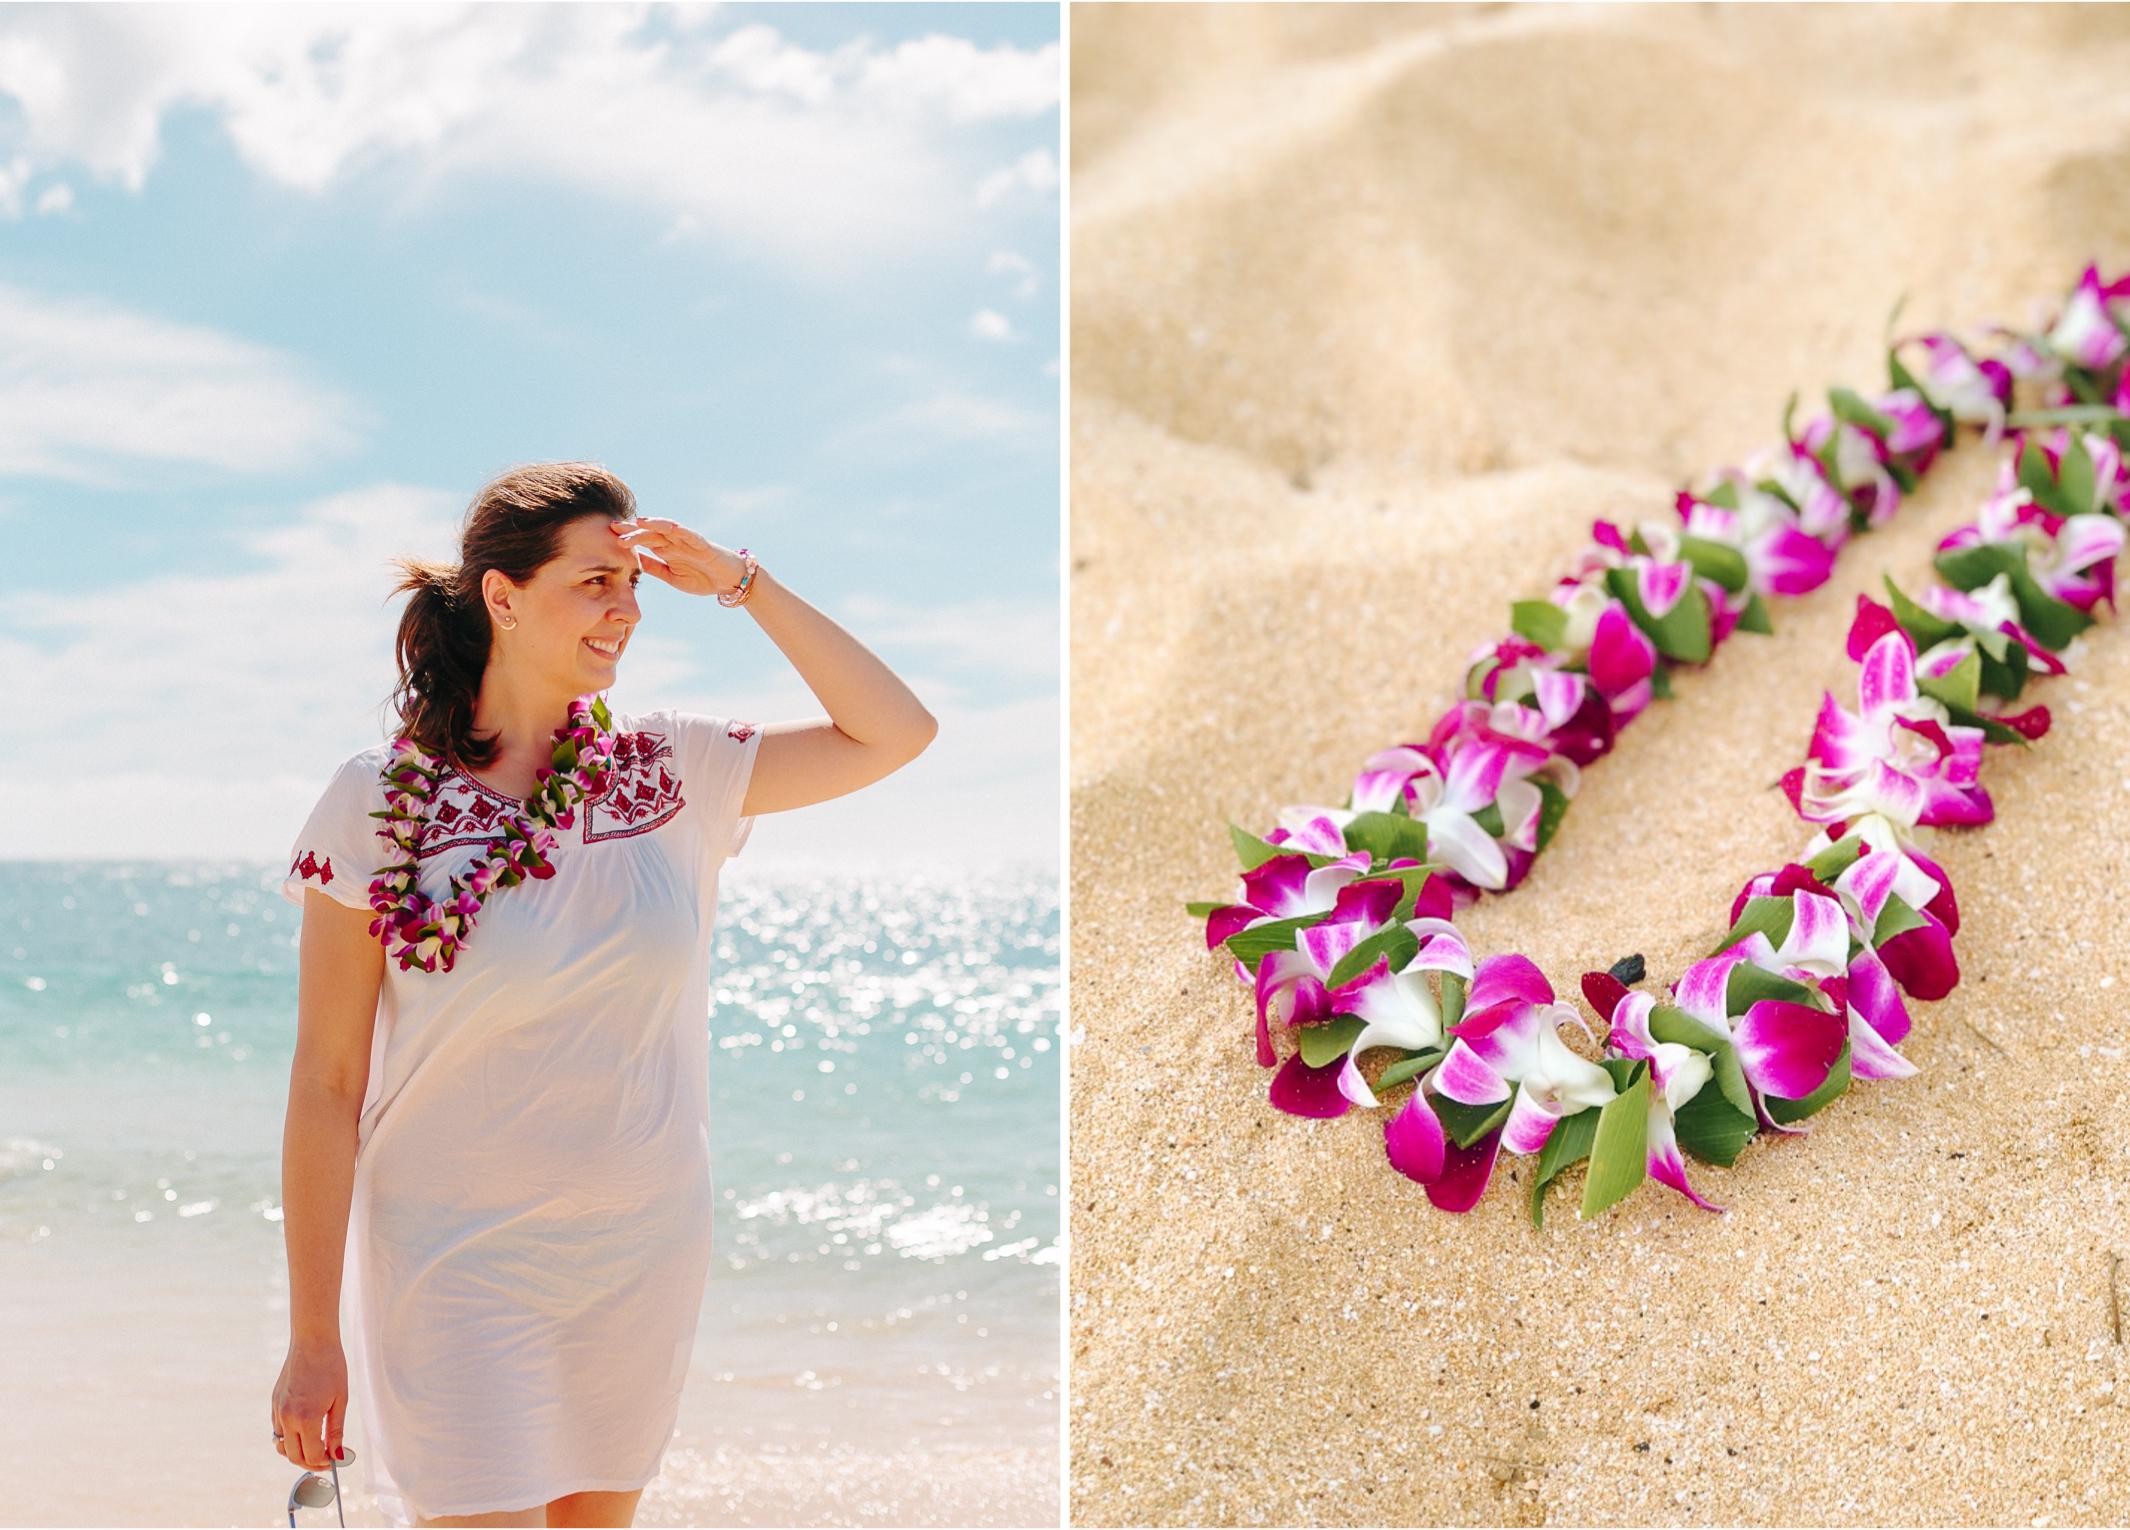 Hawaii_Maui_Dragana_P-9.jpg